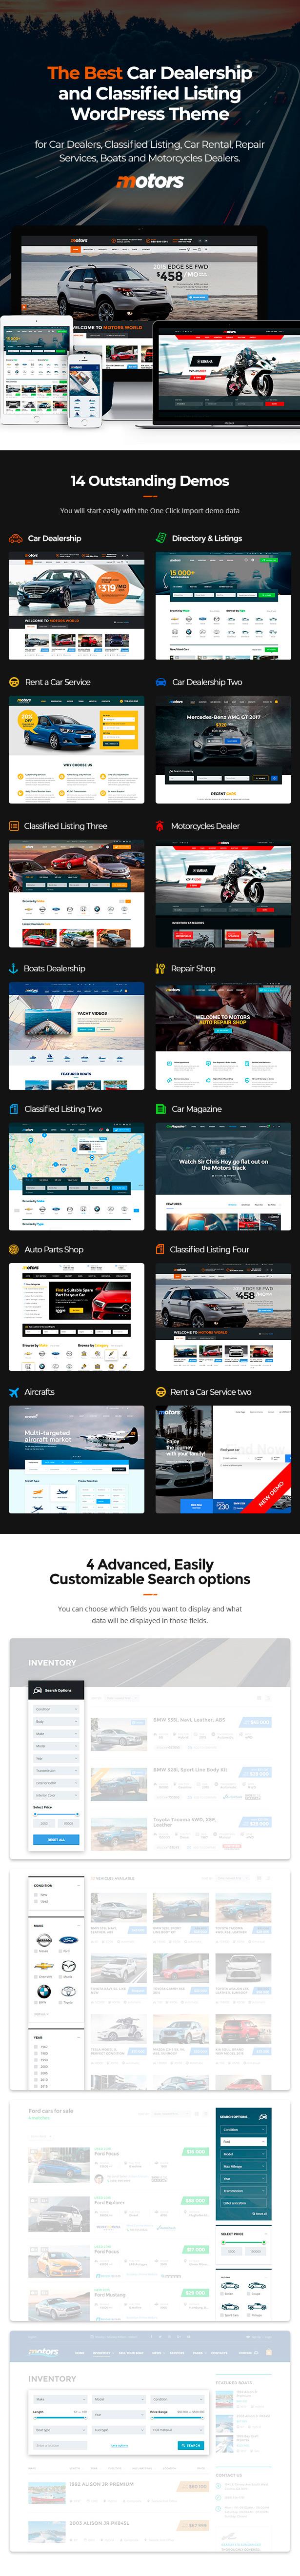 Motors - Car Dealer and Rental, Classified WordPress theme - 4